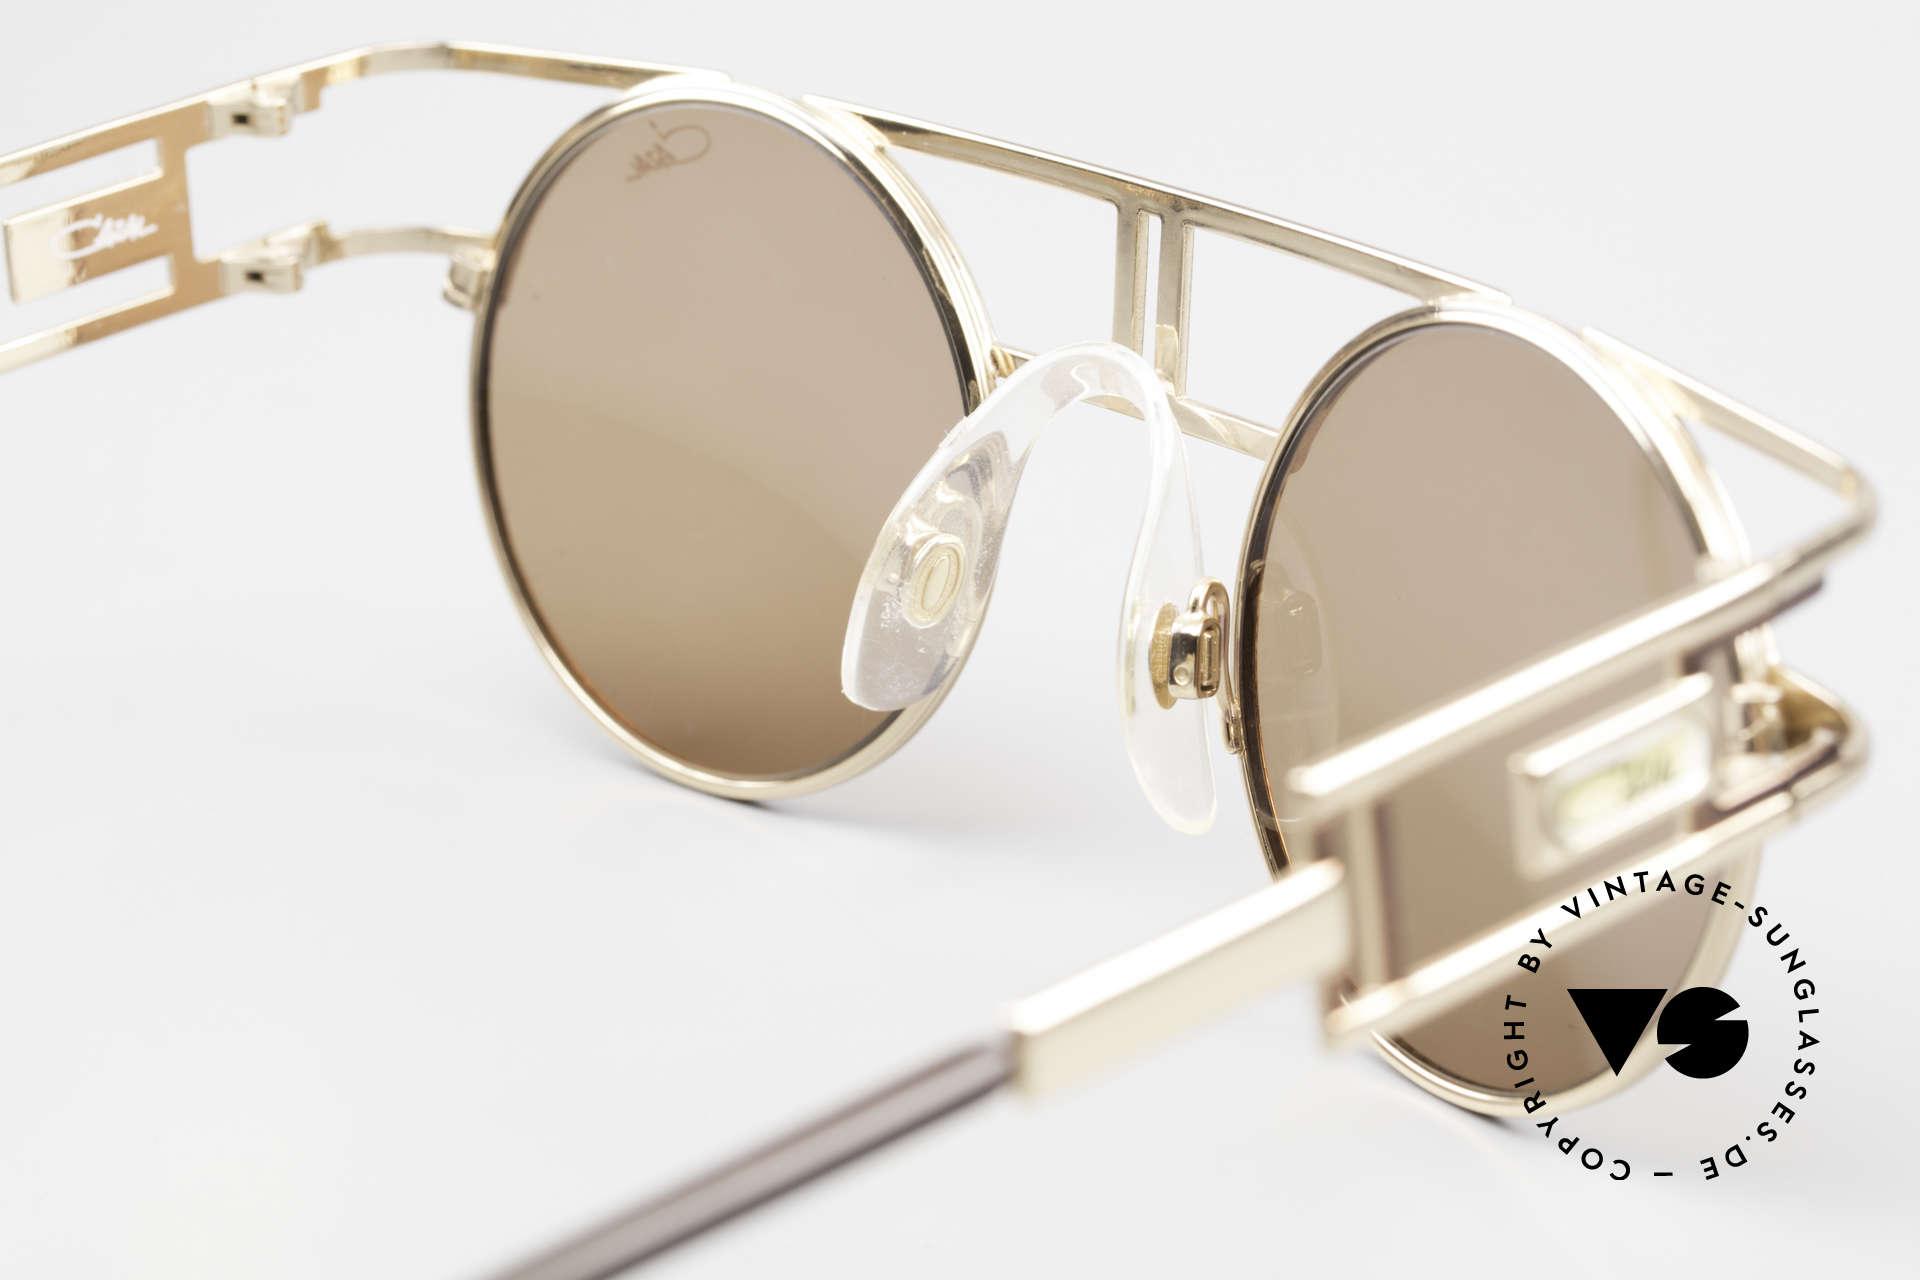 Cazal 958 90's CAzal Celebrity Sunglasses, with orig. CAZAL sun lenses for 100% UV protection, Made for Men and Women